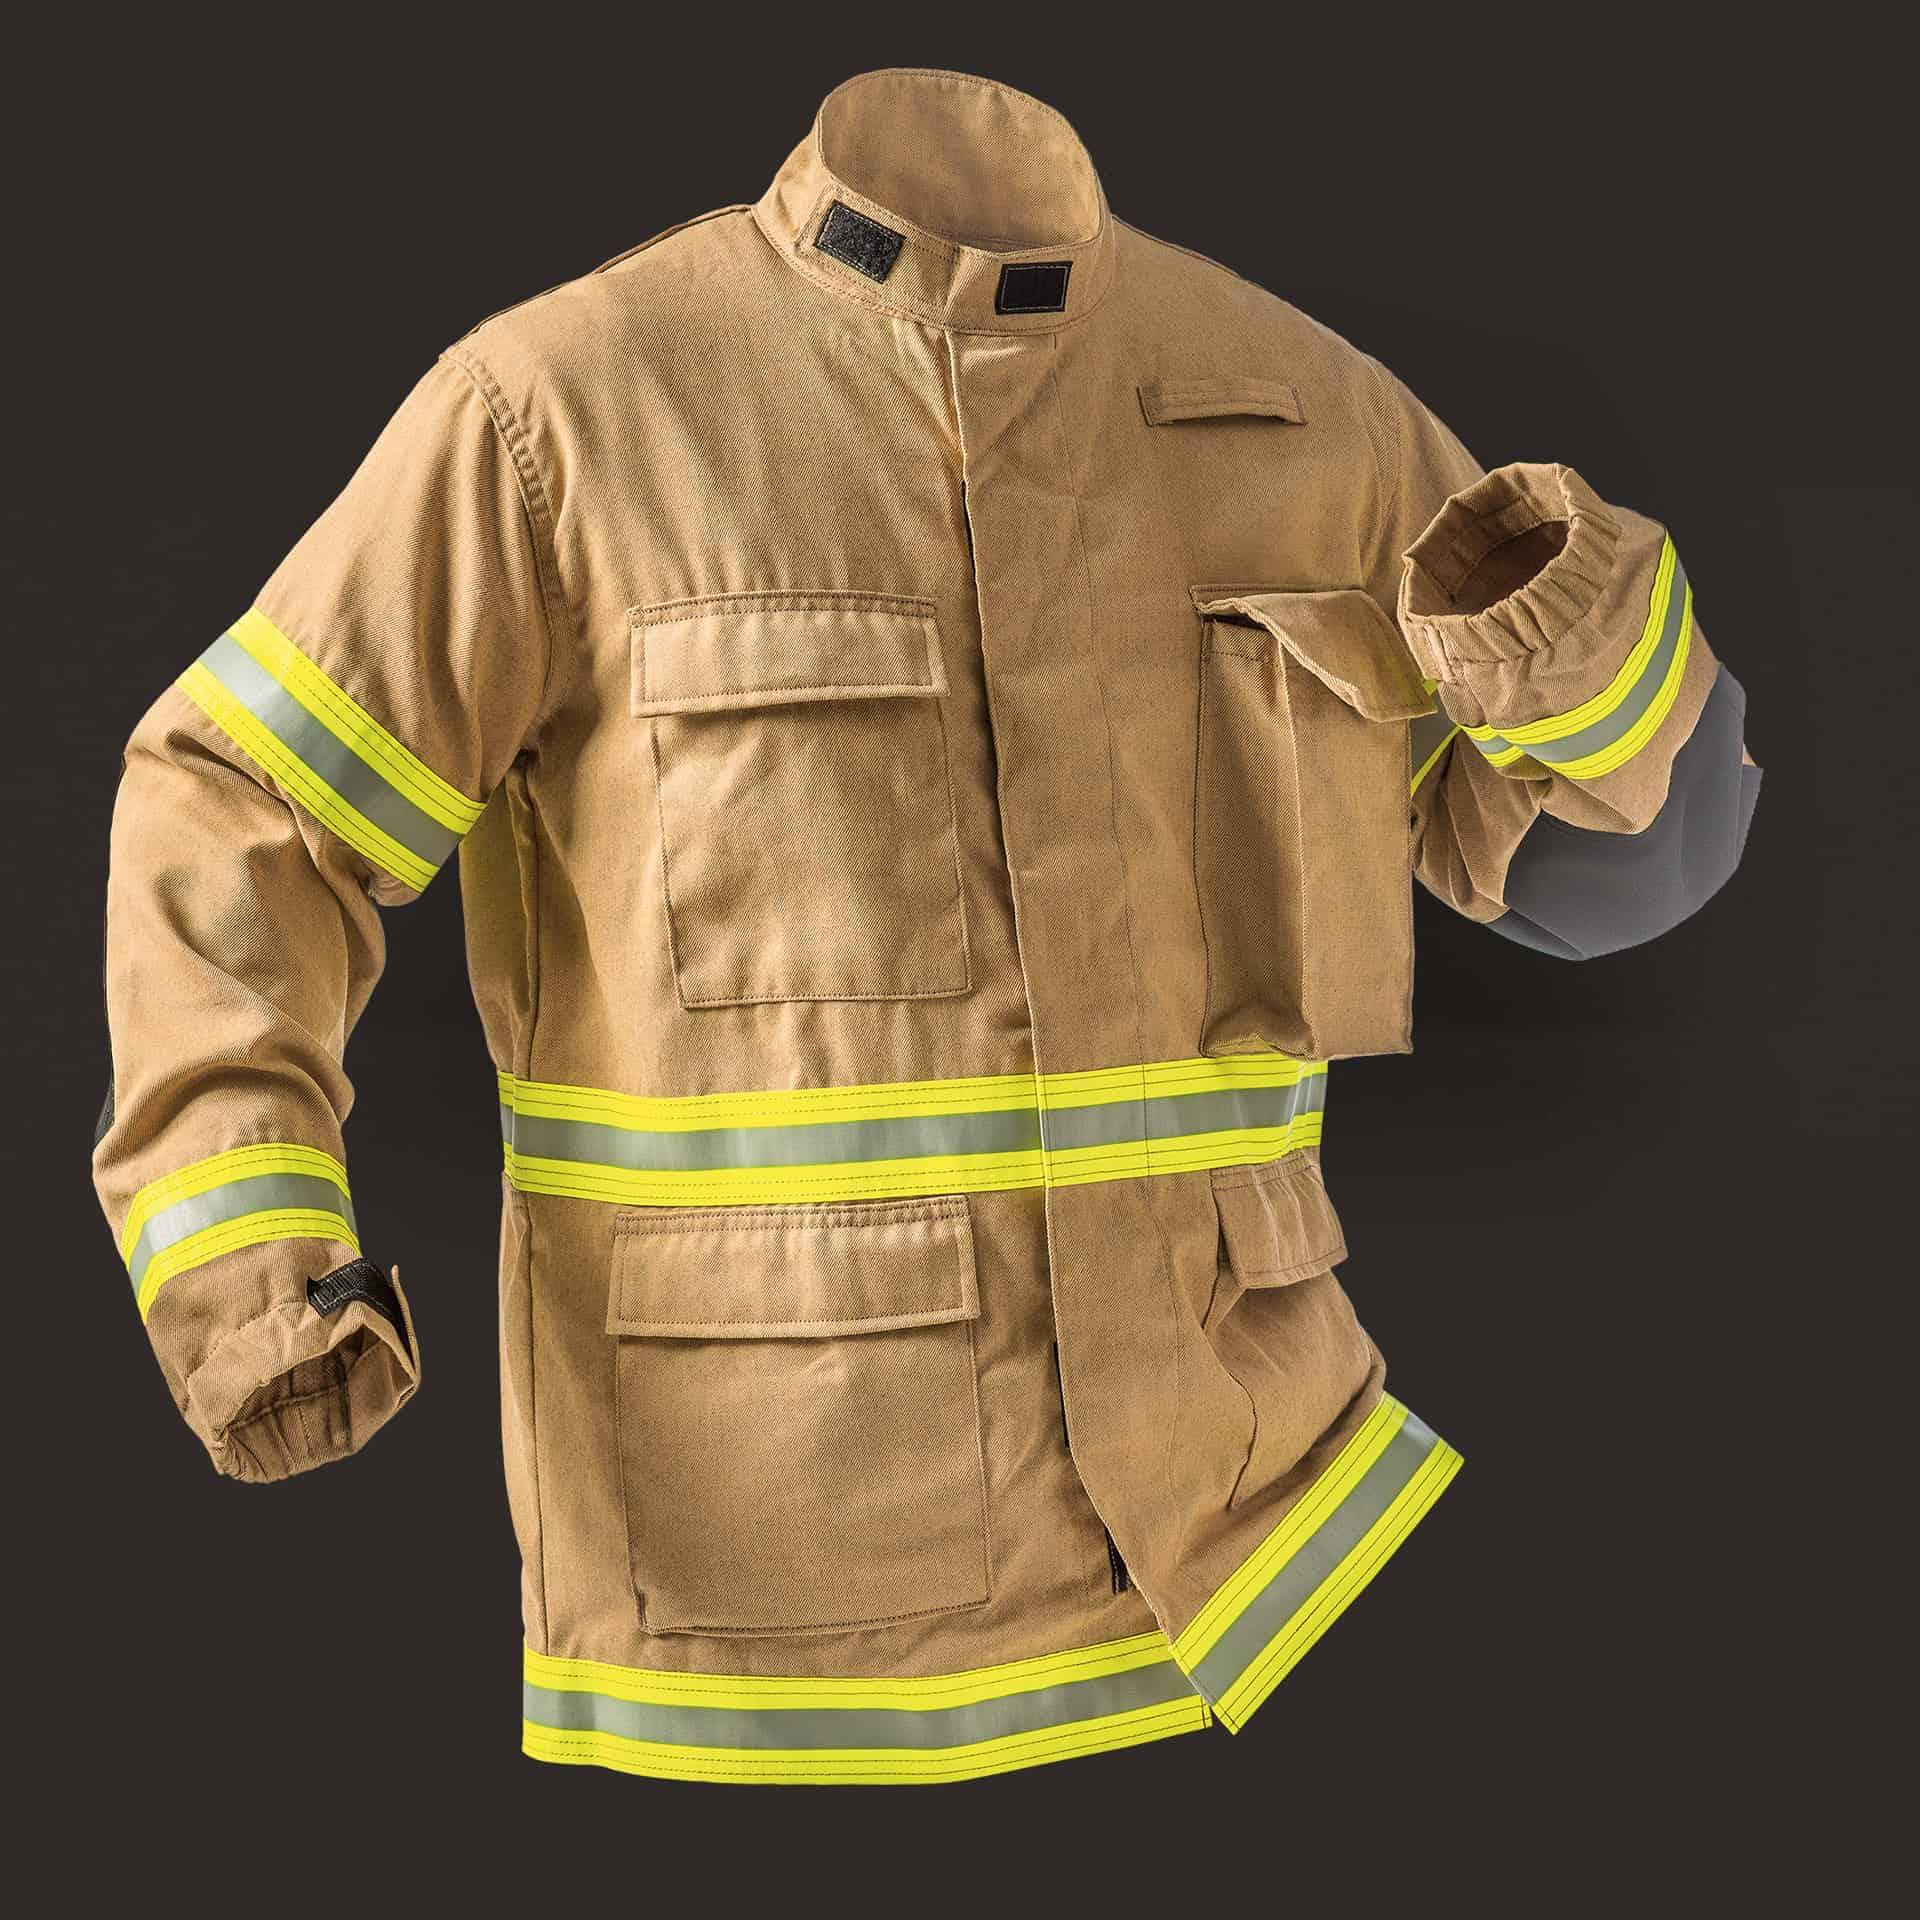 7tecgen-level-3-jacket-tan-front